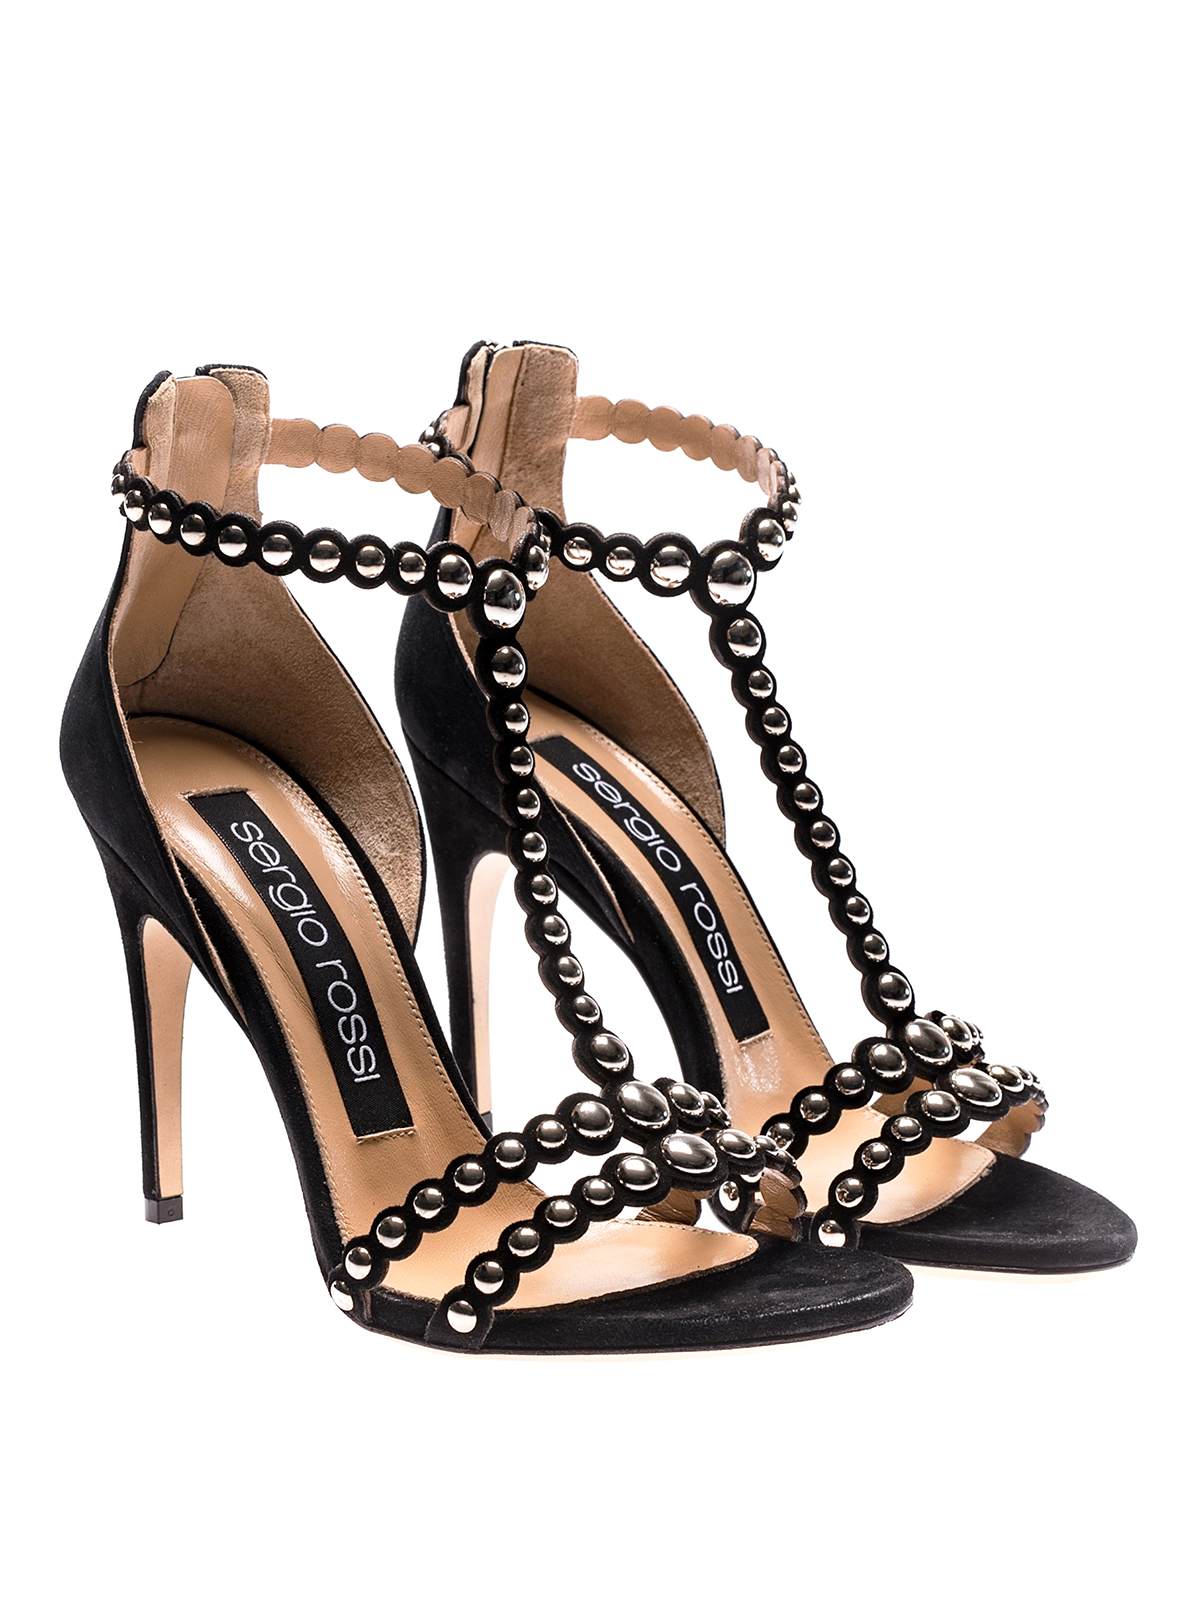 528b76ec89b10 SERGIO ROSSI  sandals online - Dafne stud embellished sandals